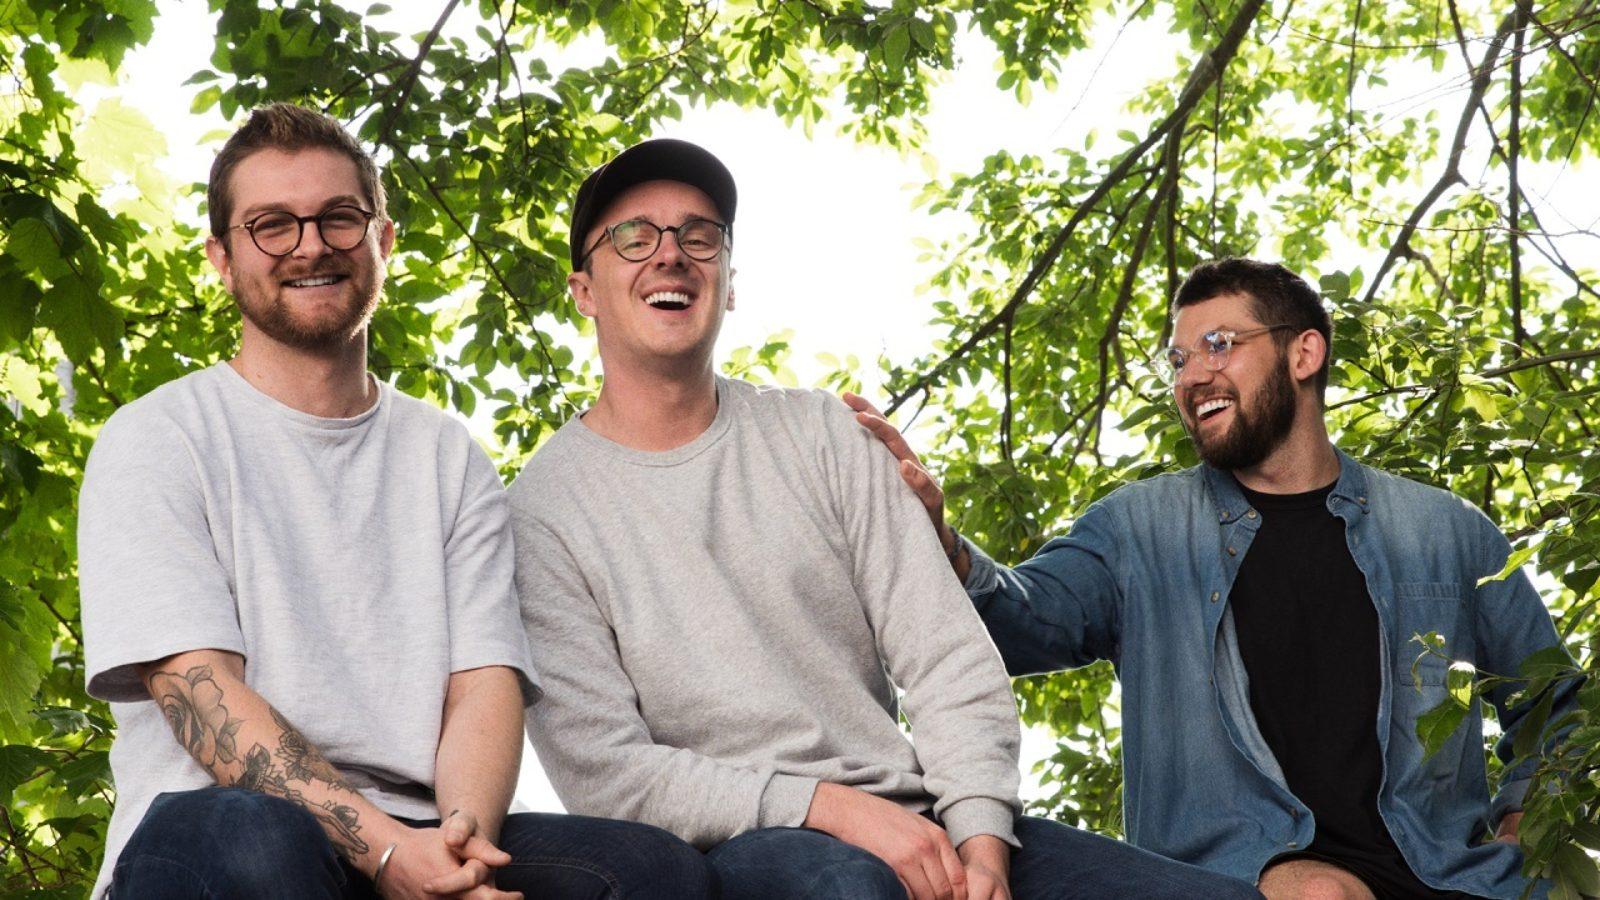 North-east creative production studio Snap announces rebrand